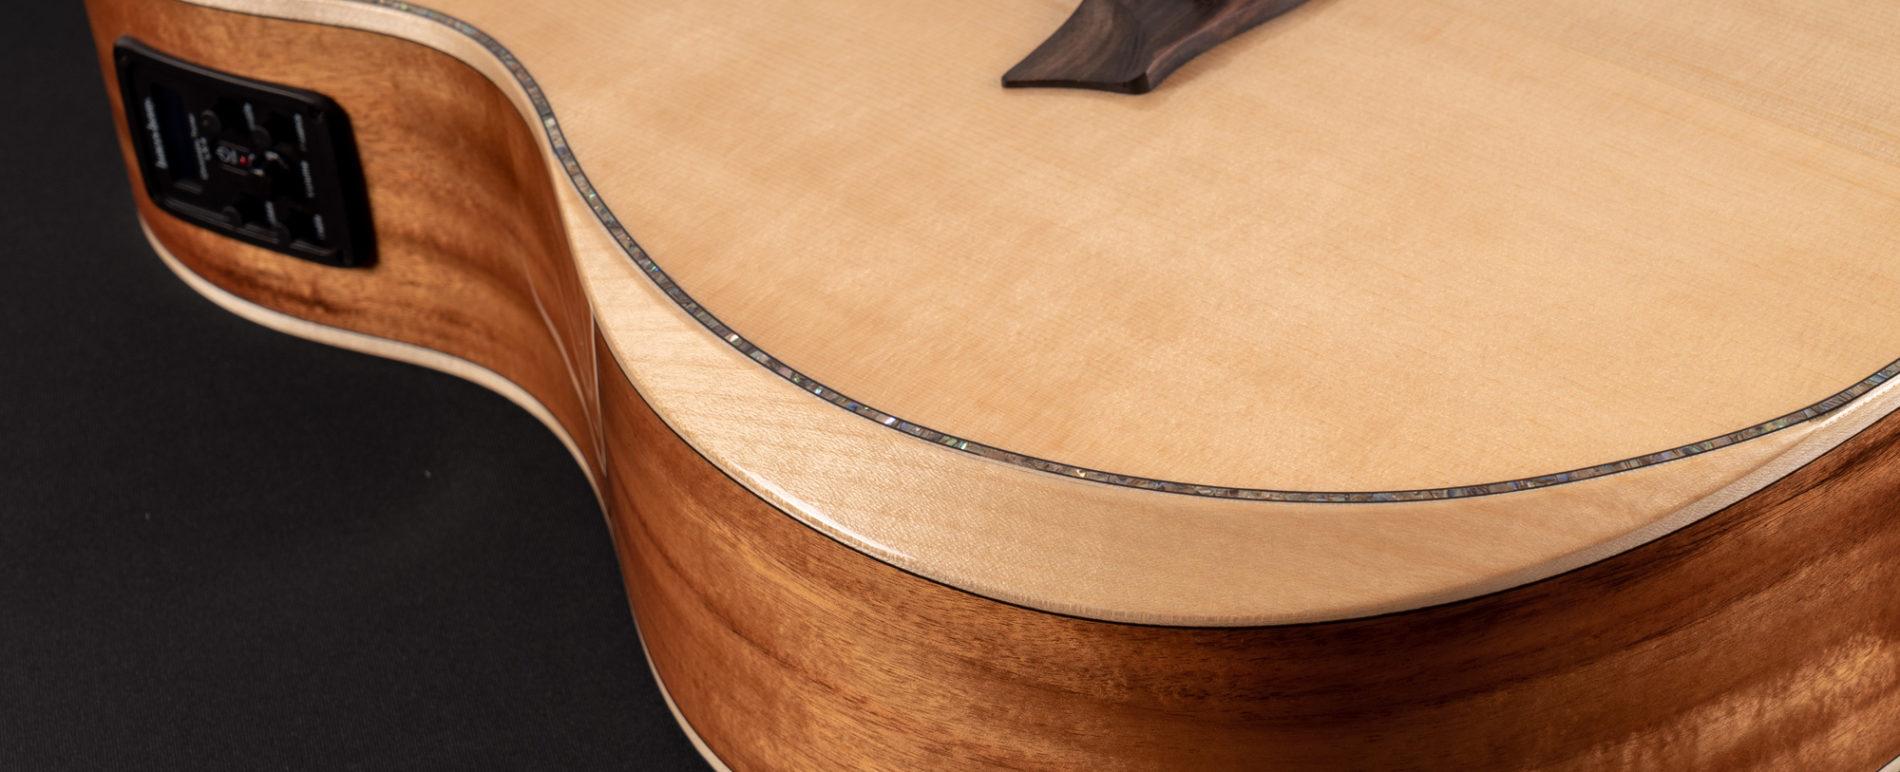 BTSC56SCE BELLA TONO ALLURE SC56SCE close up of the comfort bezel